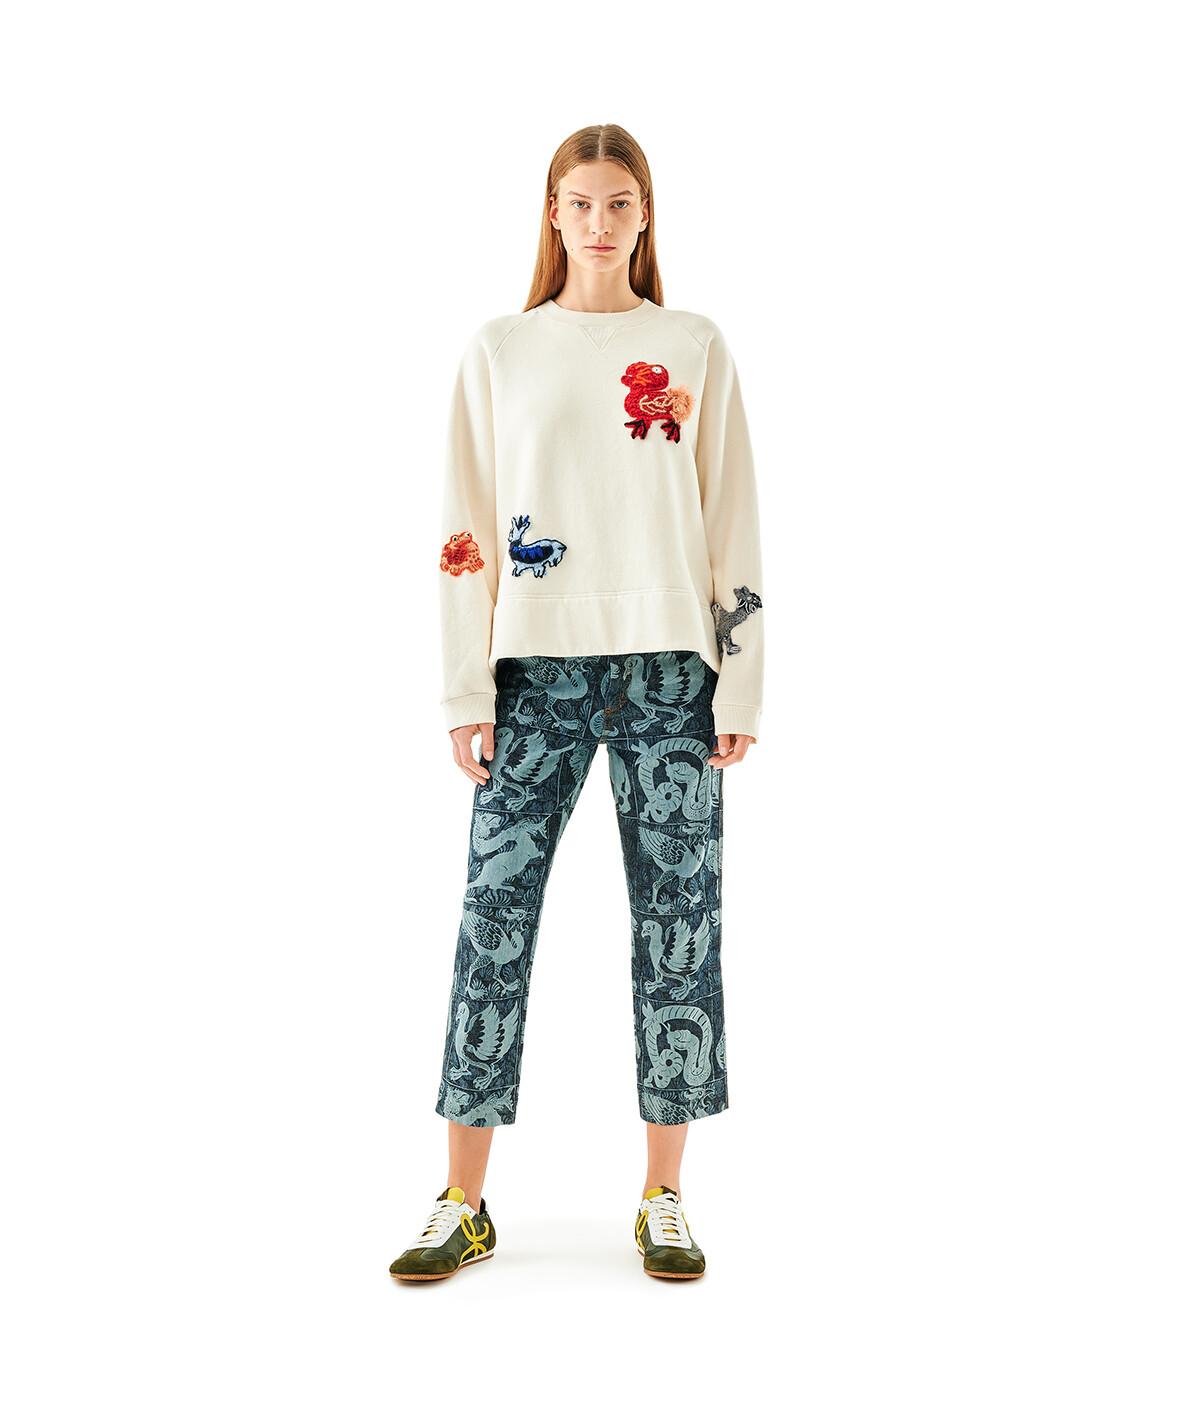 LOEWE Embroidered Sweatshirt Animals Off-White front